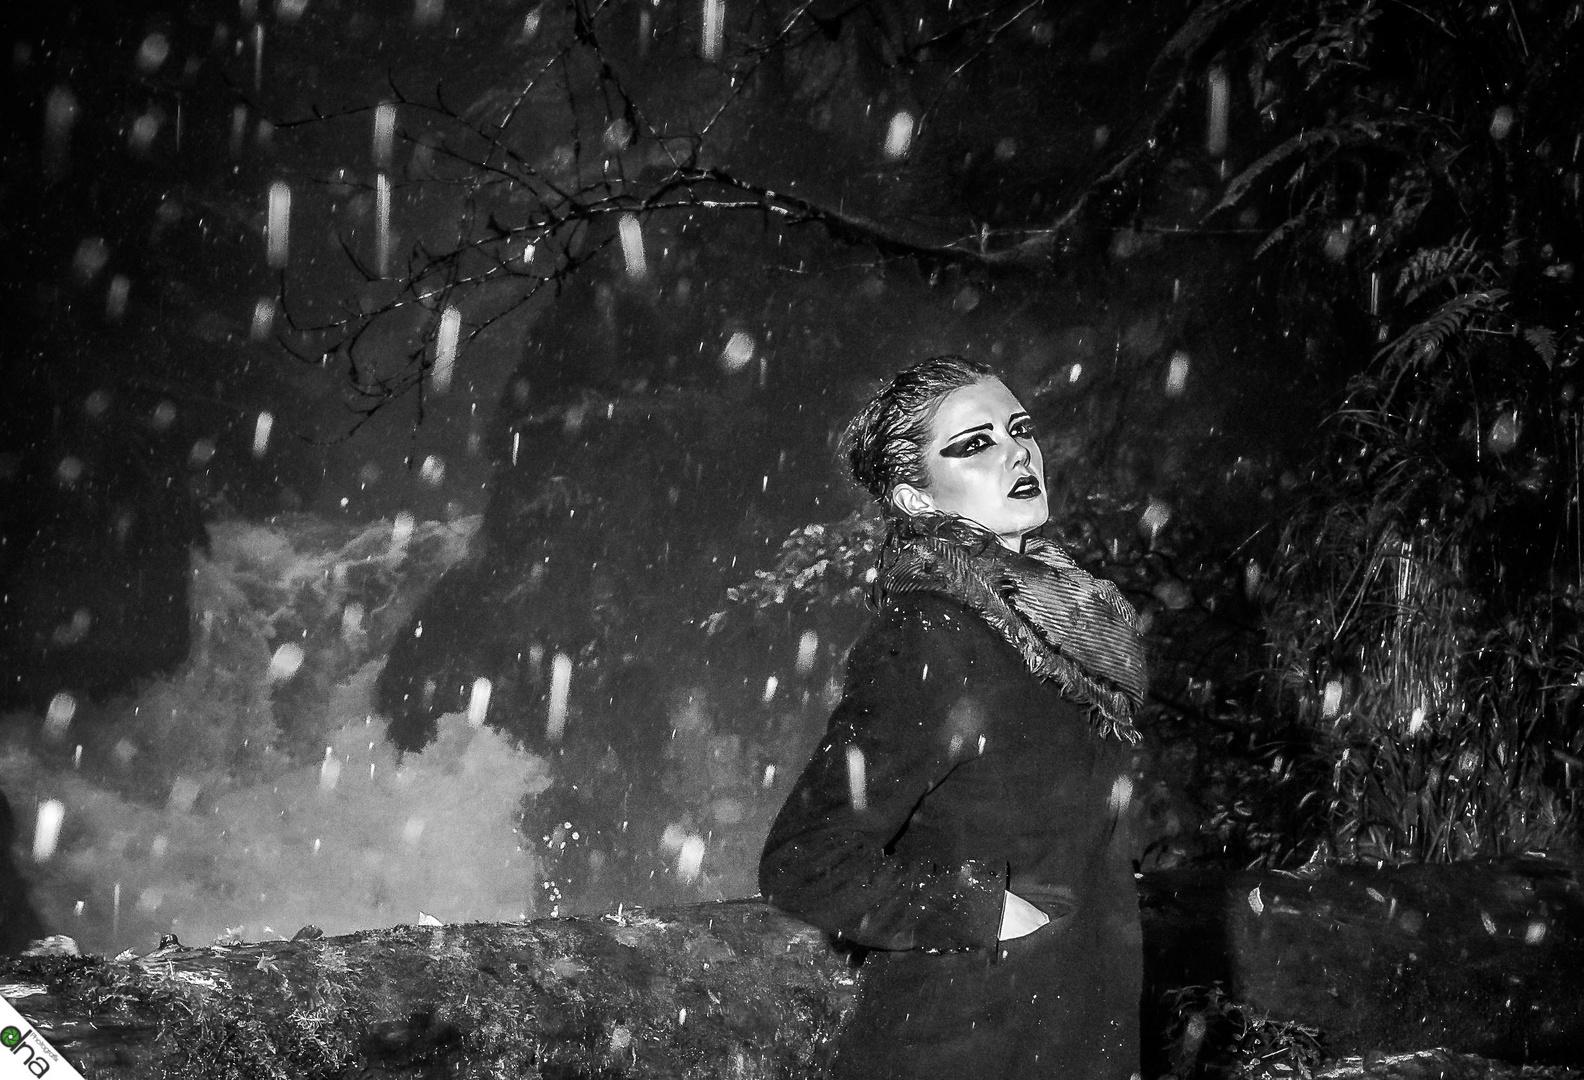 Snow is fallen